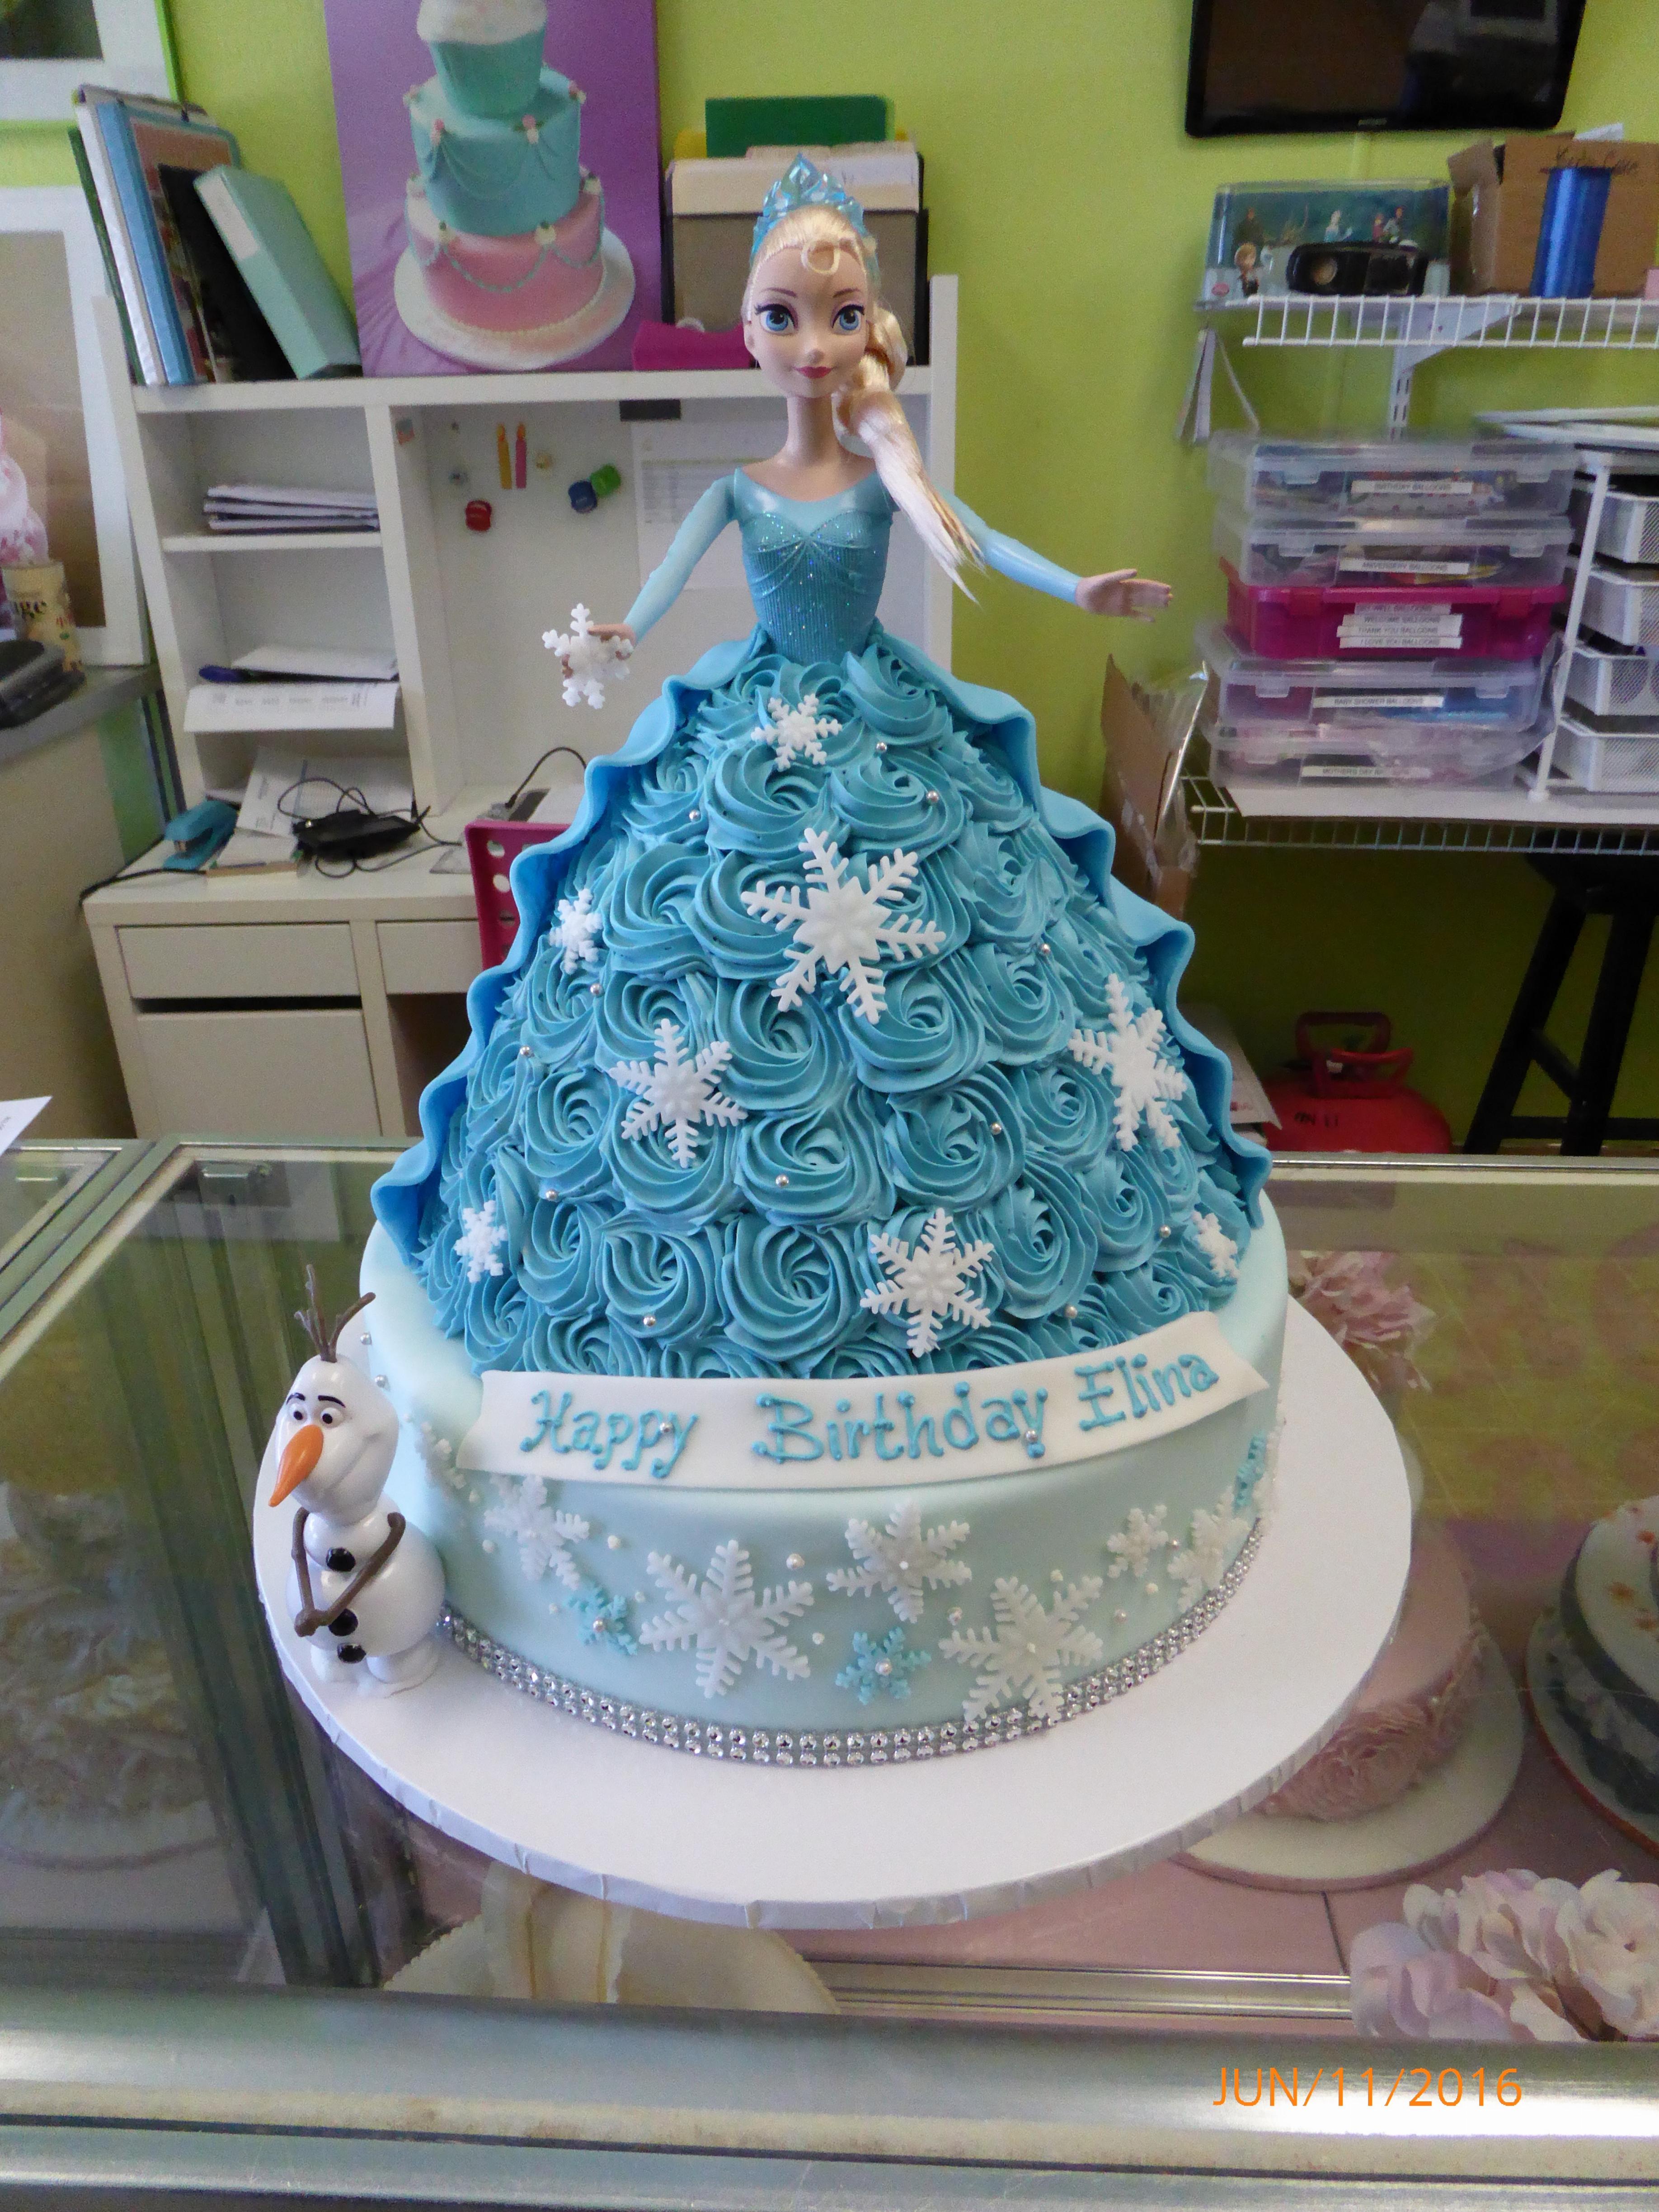 3008, birthday, elsa, frozen, barbie cake, barbie, disney, disney princess, blue, white, snow, snowflake, snowflakes, olaf, tiered, carved